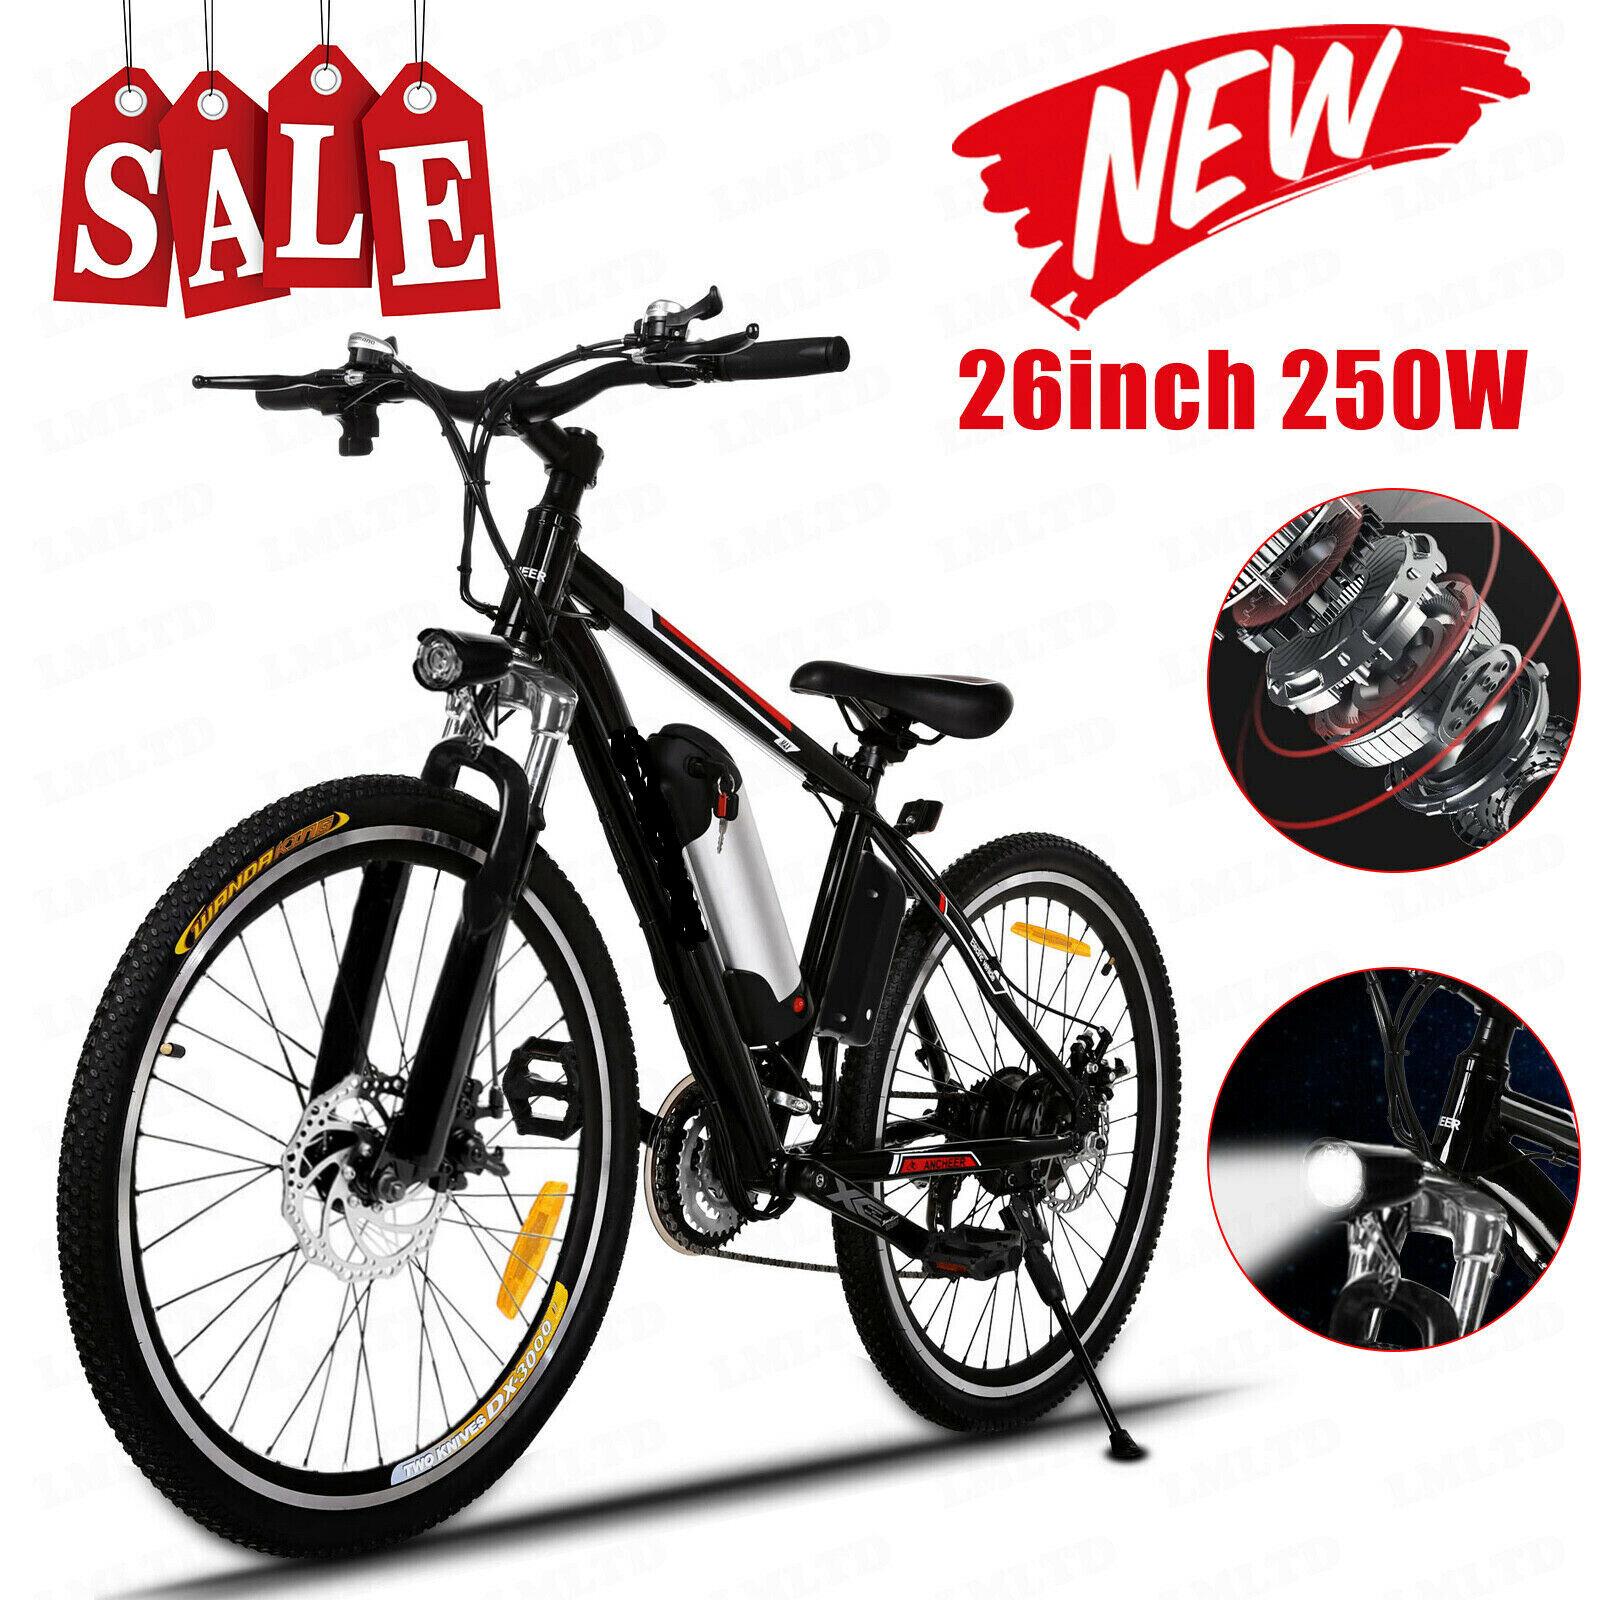 Ancheer Elektrofahrrad 26 zoll Mountainbike Bergfahrrad E-Bike Shimano Pedelec